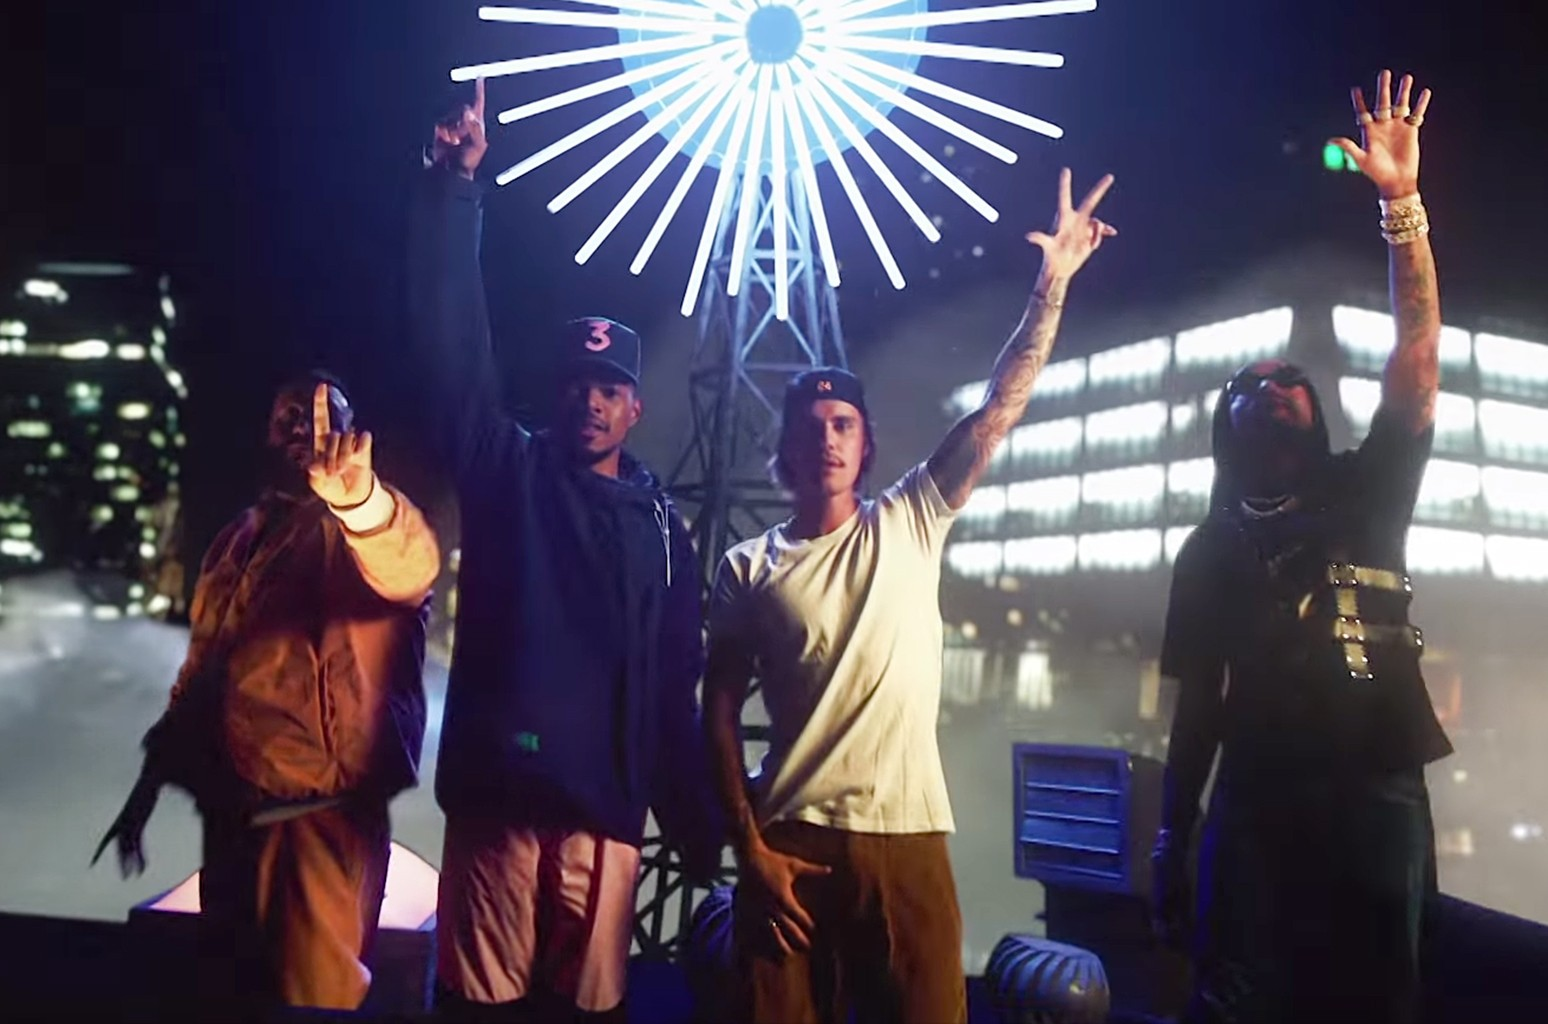 DJ Khaled, Chance The Rapper, Justin Bieber & Quavo